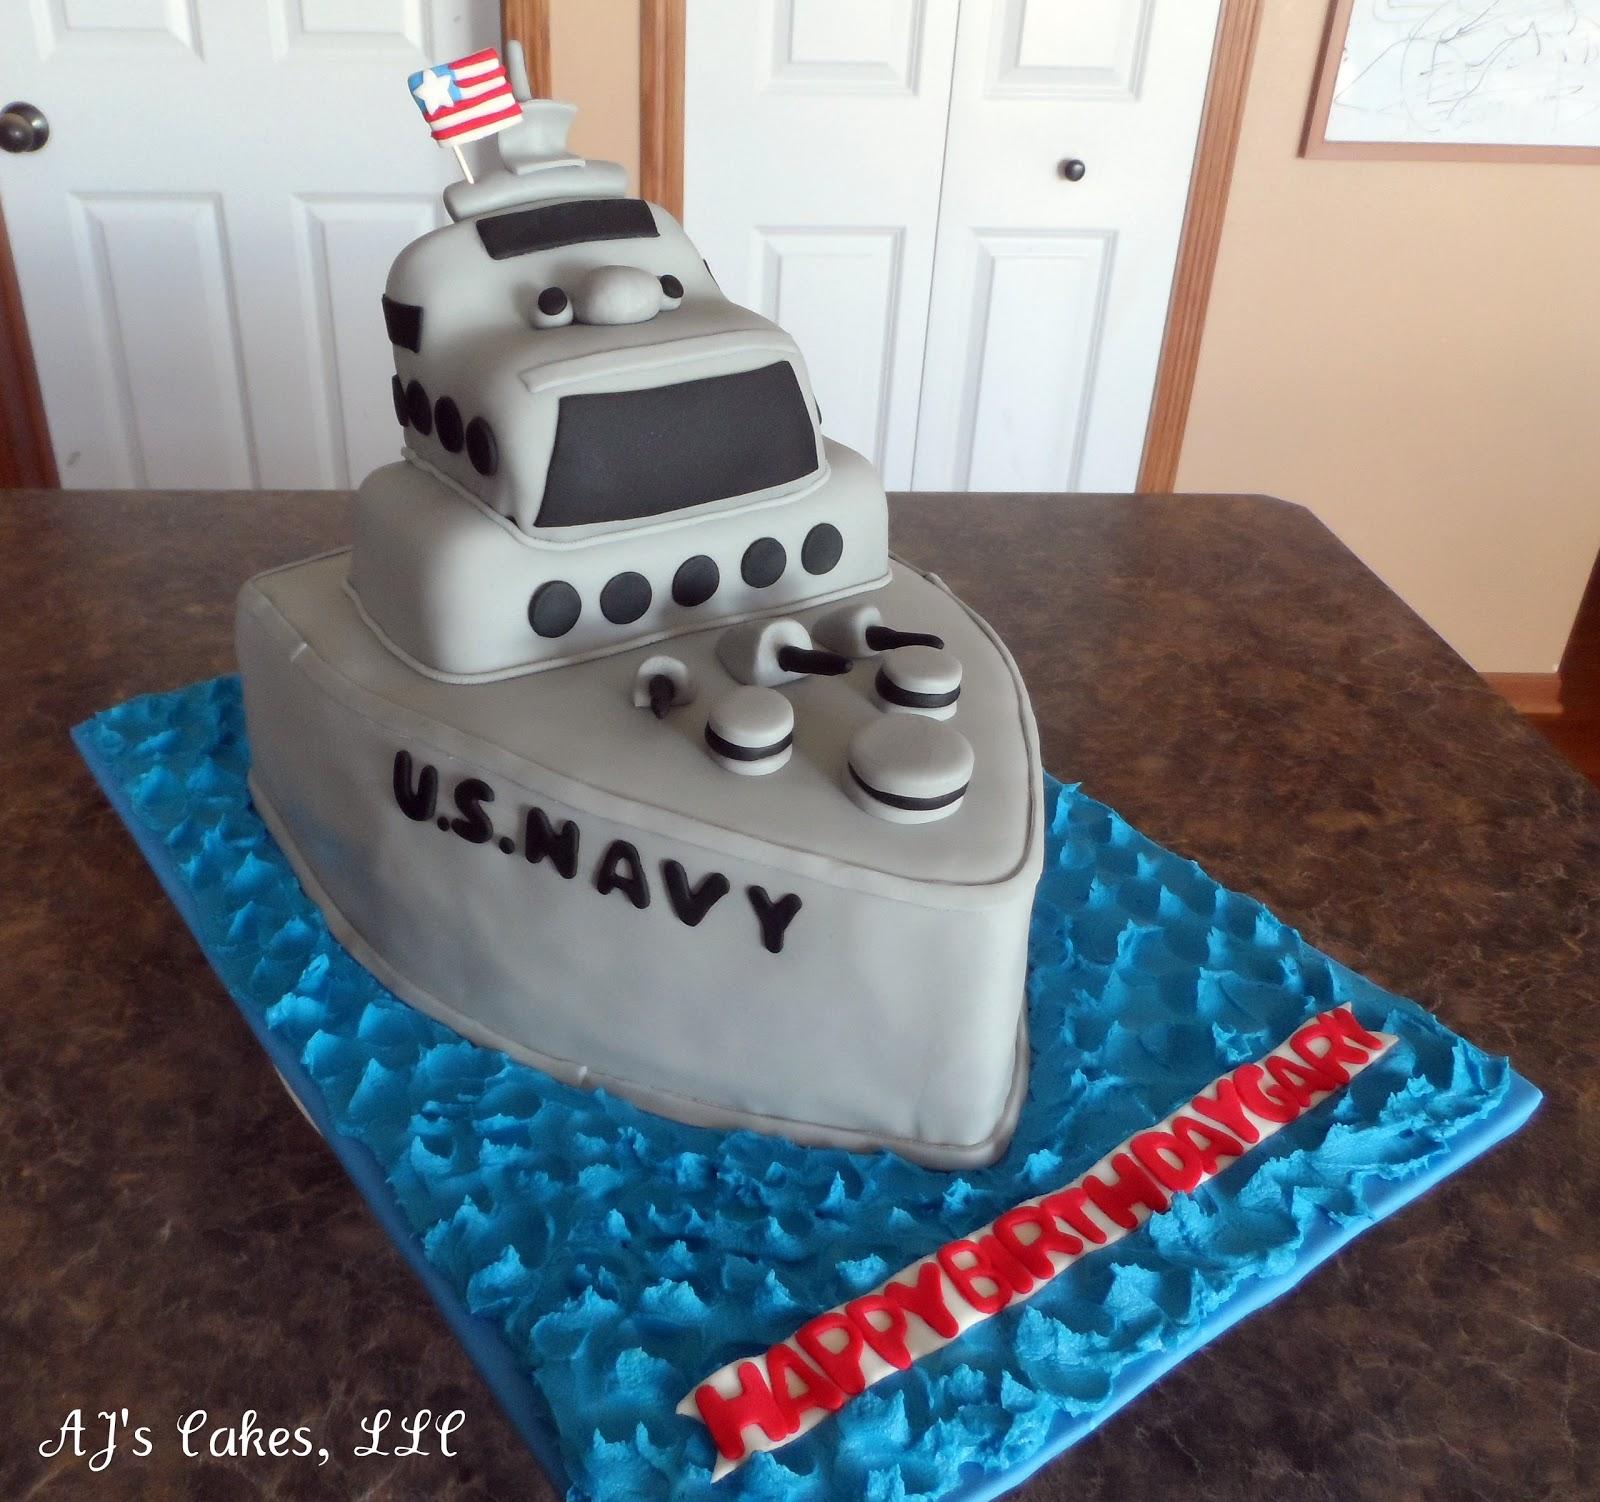 Surprising 12 Navy Ship Birthday Cakes Photo Navy Ship Birthday Cake Us Funny Birthday Cards Online Fluifree Goldxyz